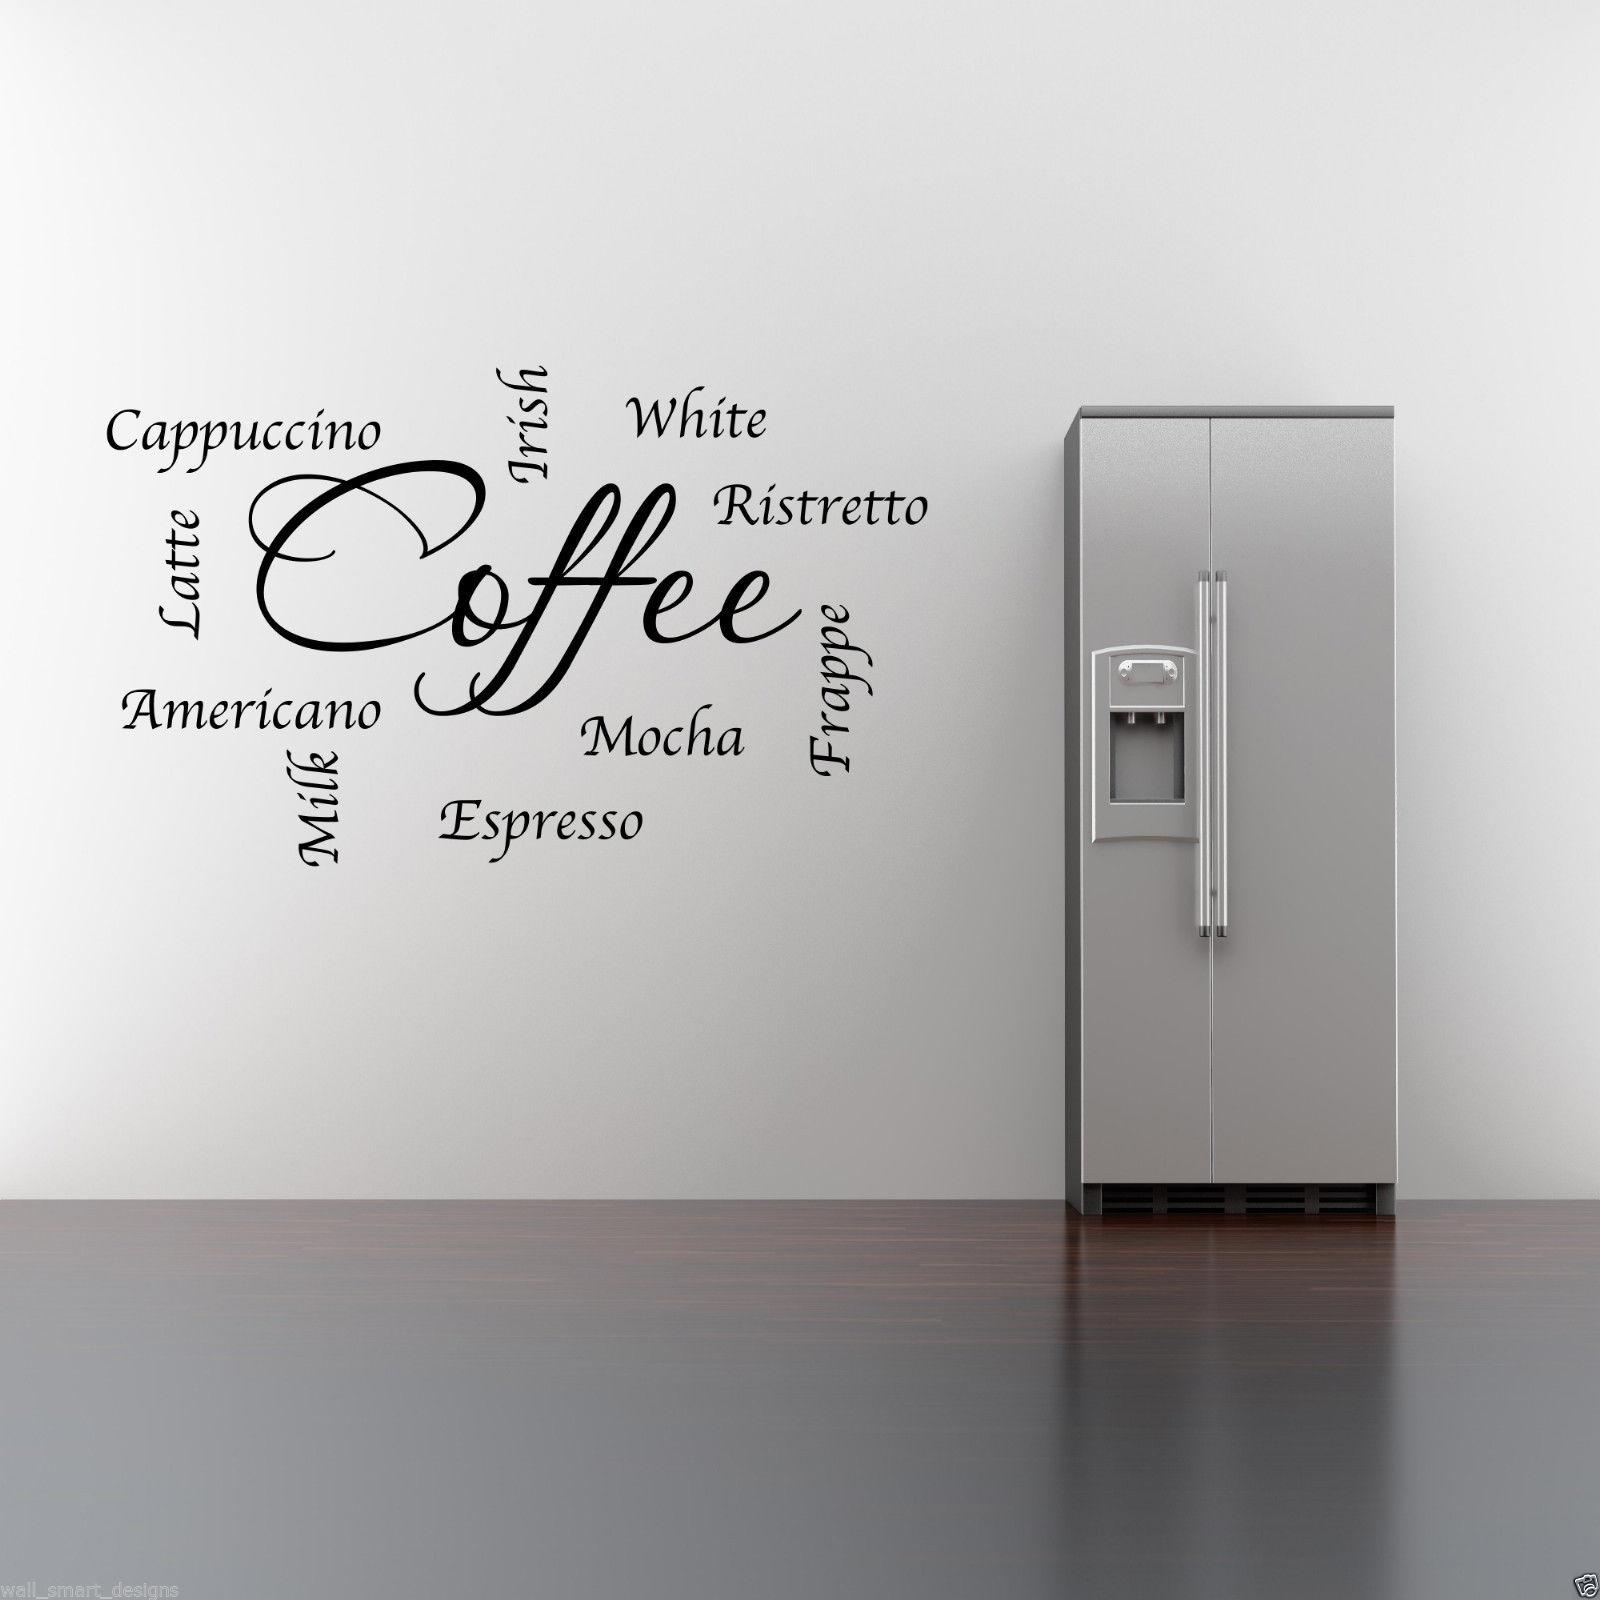 miniatura 6 - Caffe-Parole-Frasi-Cucina-Wall-Art-Sticker-Salotto-Citazione-Decalcomania-Murale-WSD403